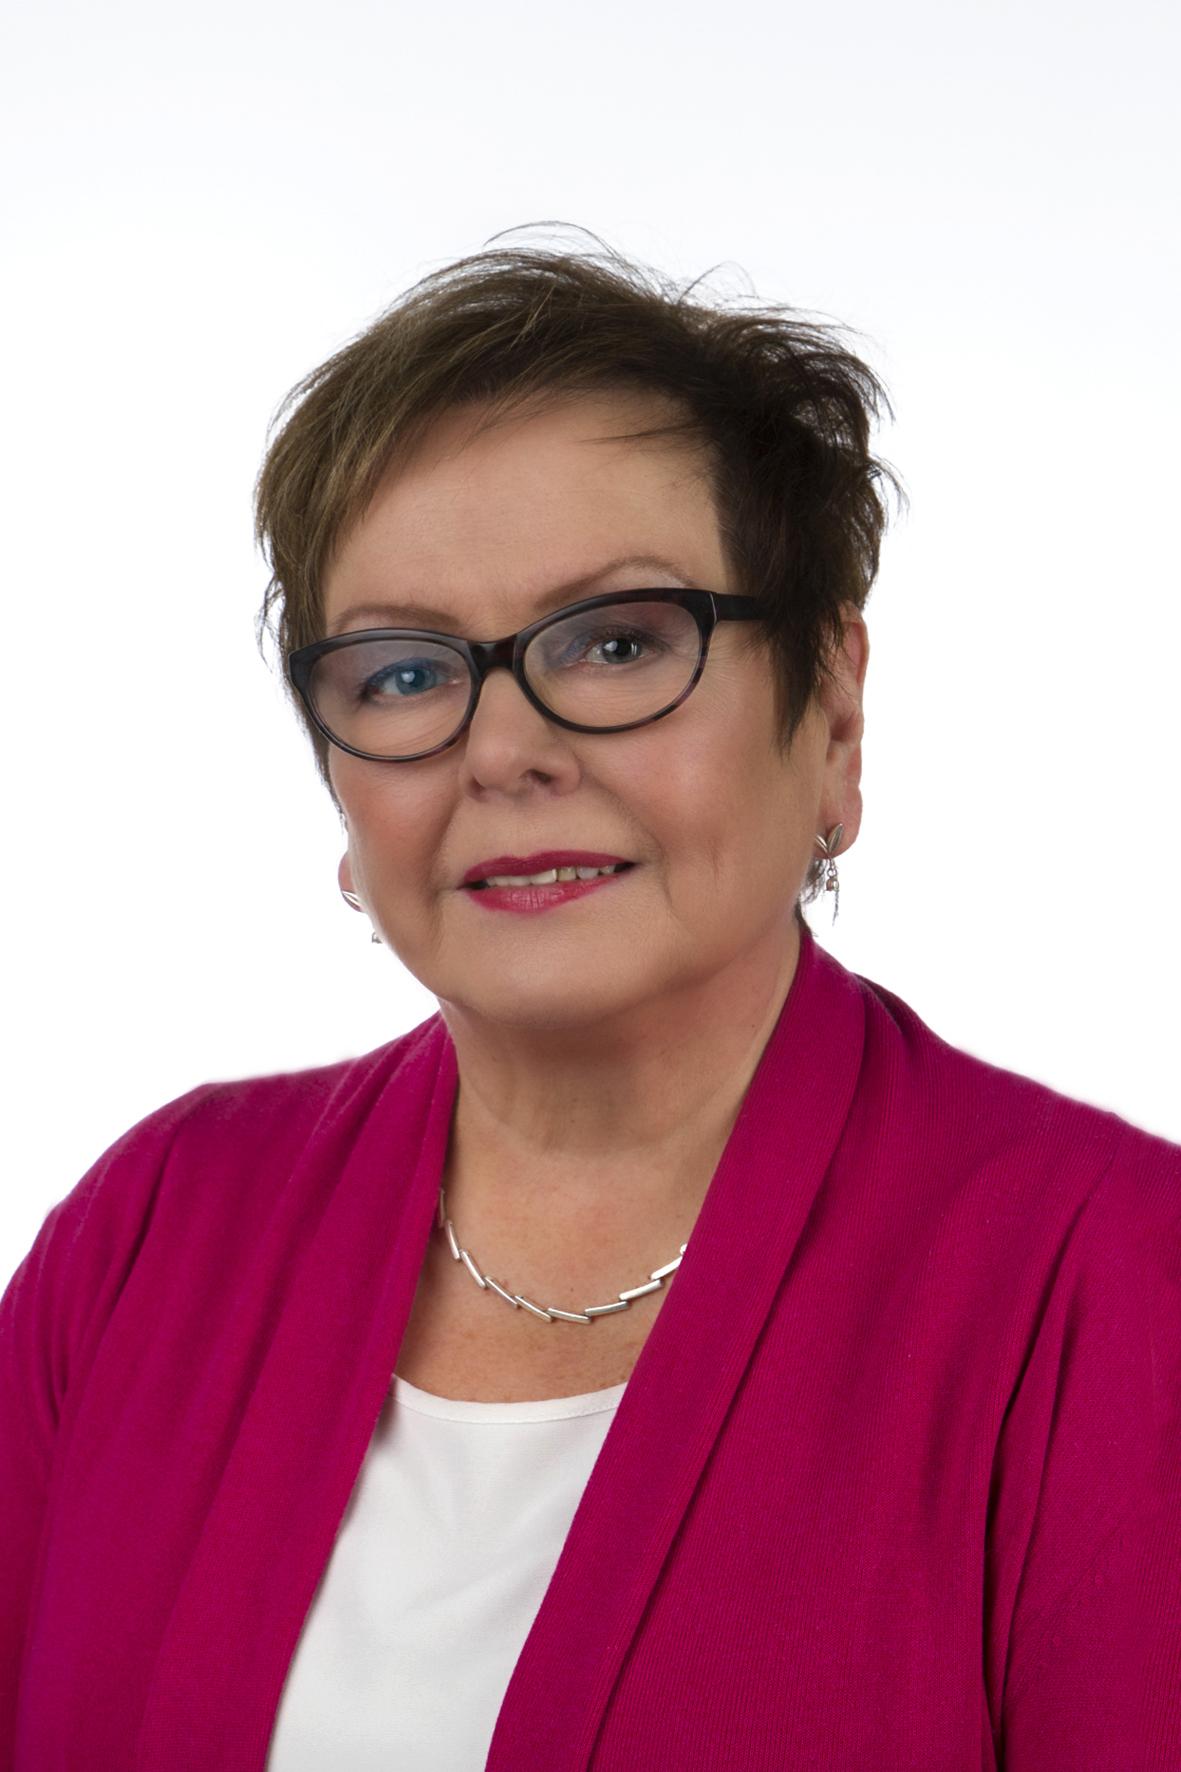 Hannele Salovaara